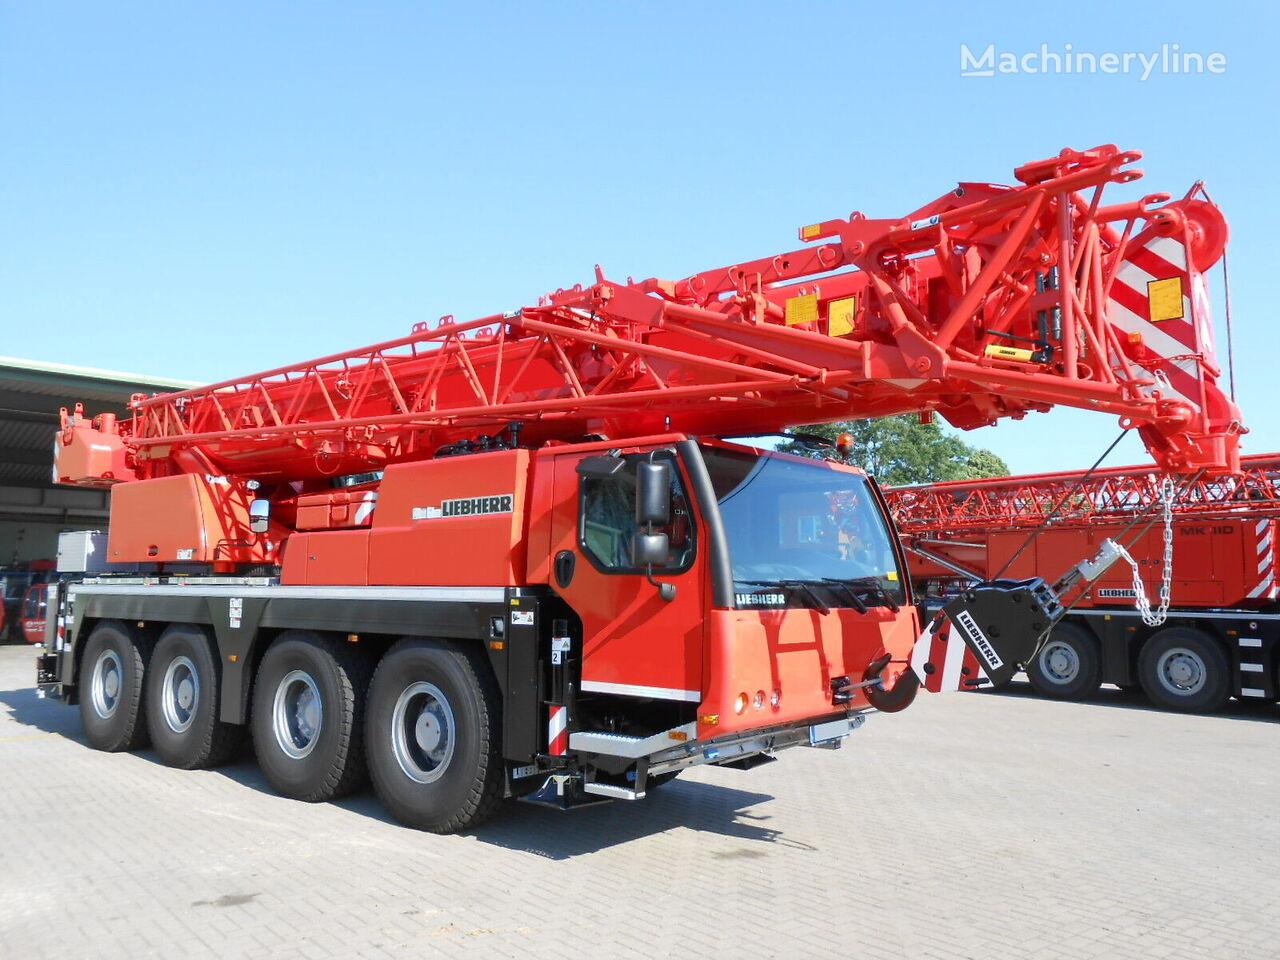 LTM 1070-4.2 on chassis LIEBHERR LTM 1070-4.2 mobile crane